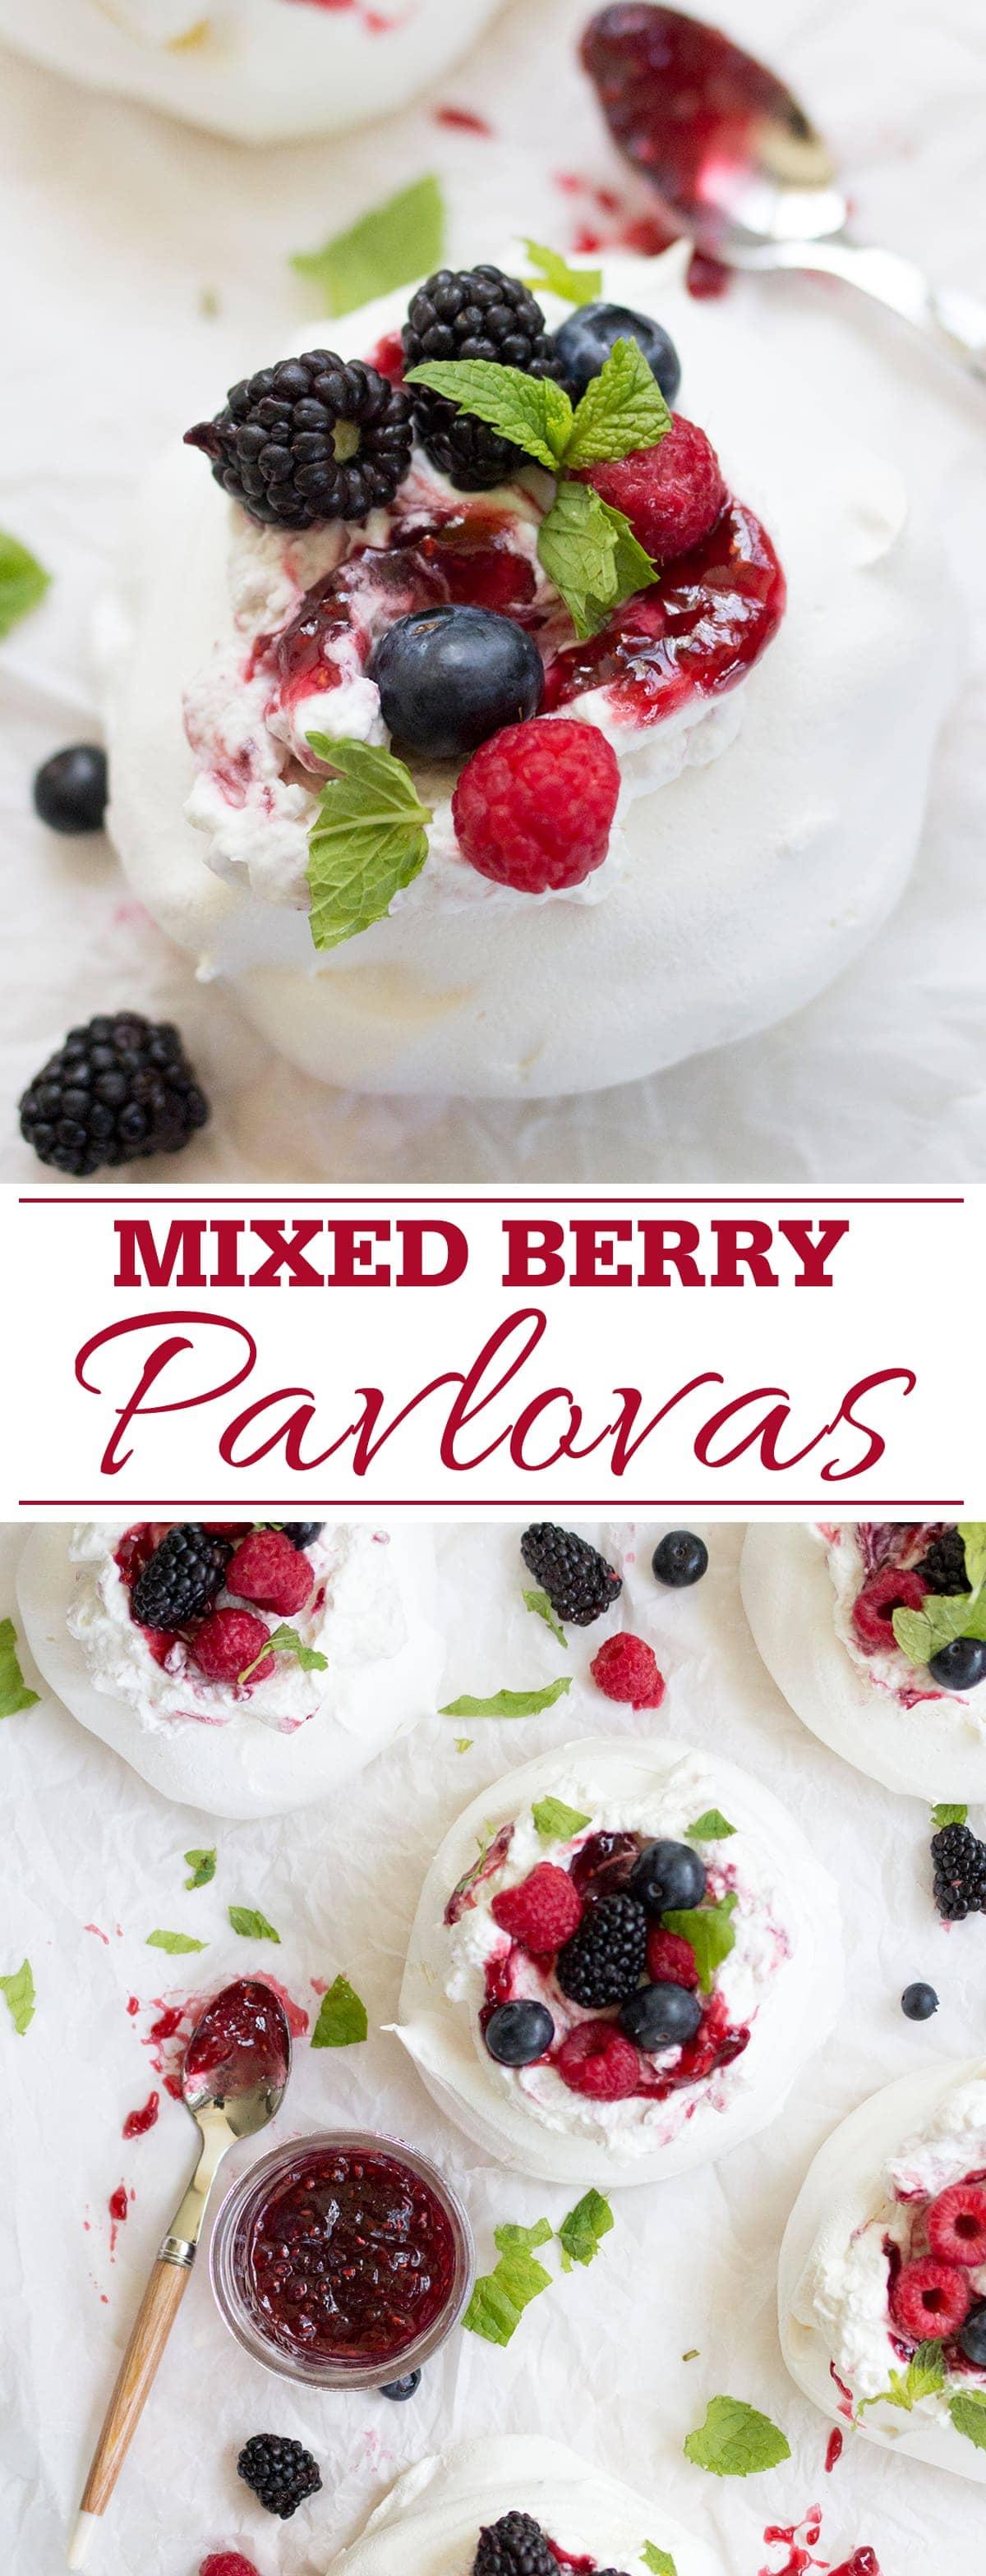 Mixed Berry Pavlovas